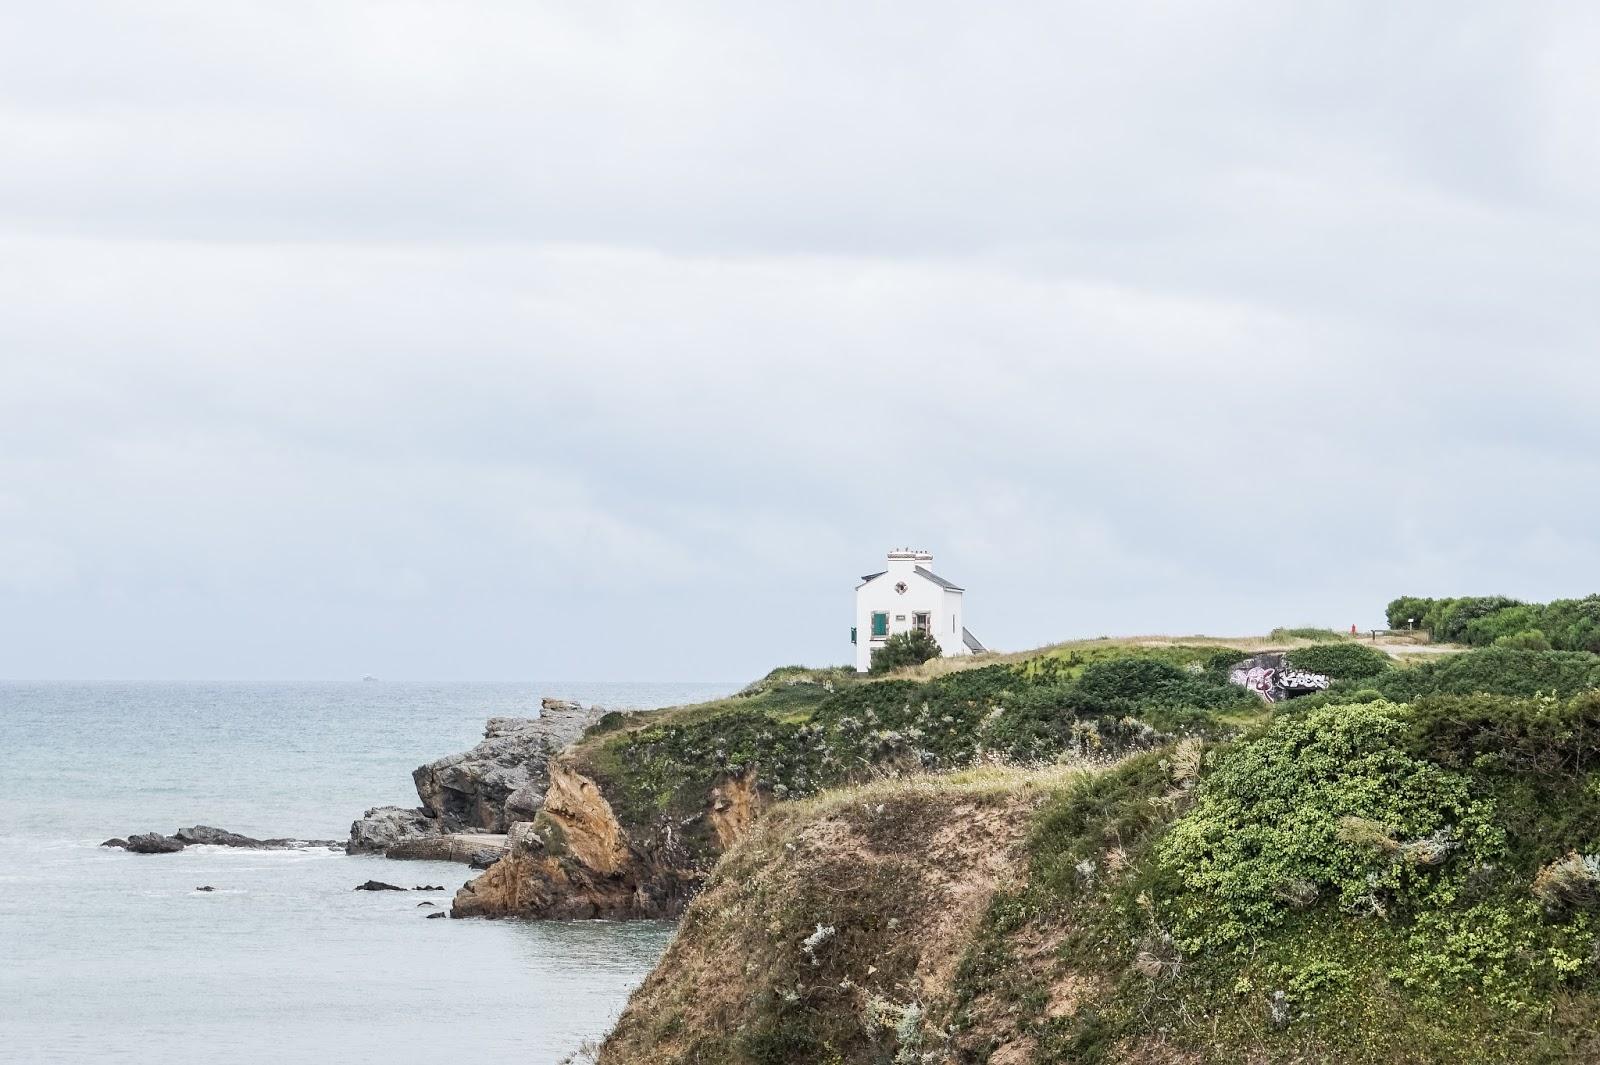 Bretagne-culture-placestovisit-france-beautiful